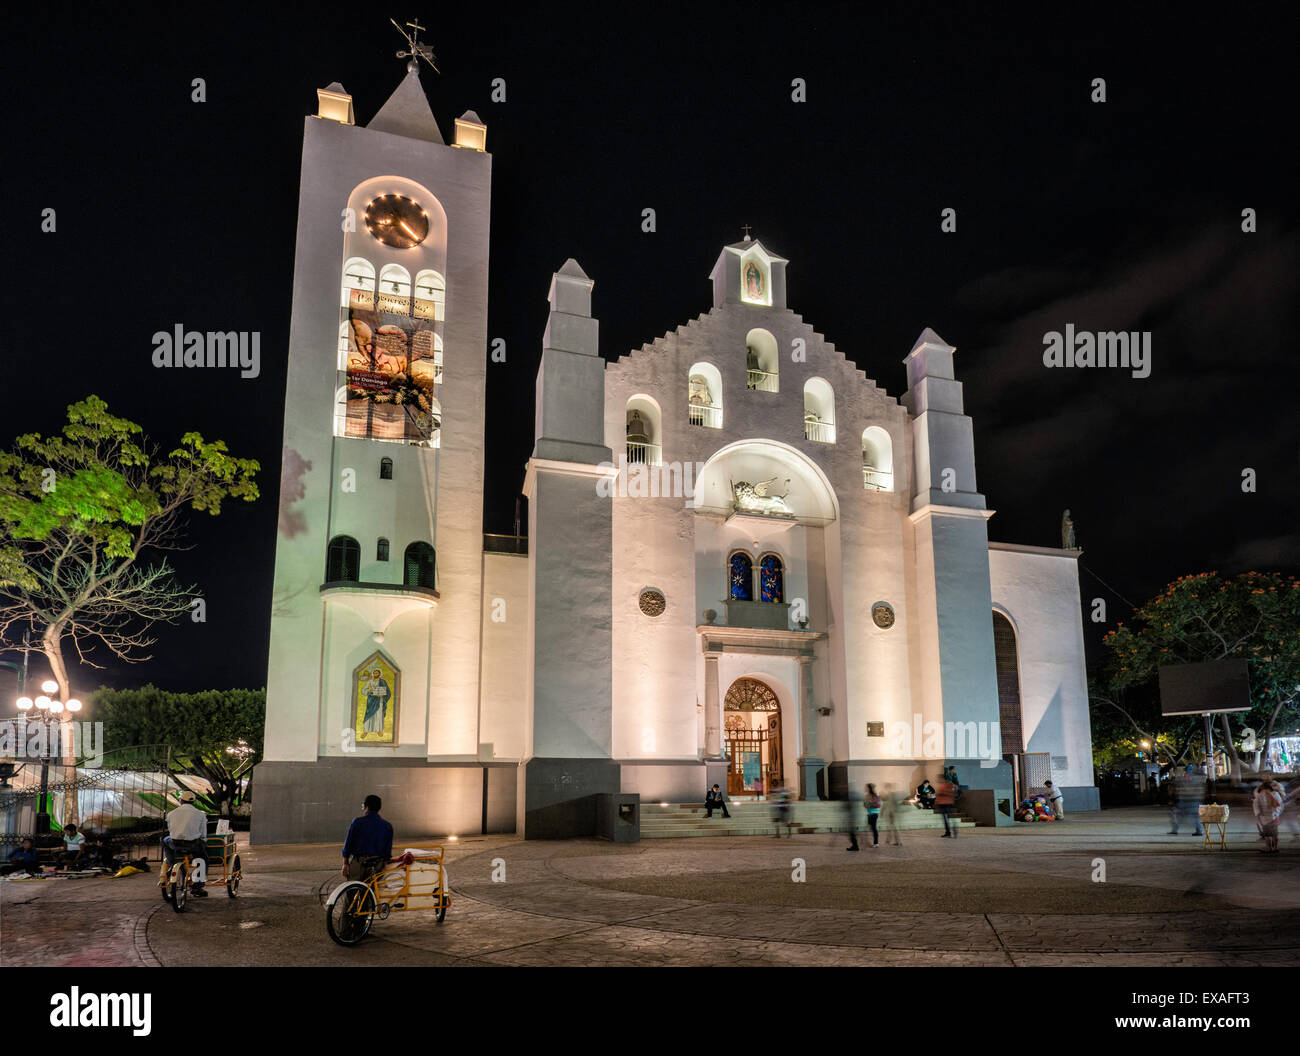 Catedral de San Marcos at Plaza Civica in Tuxtla Gutierrez, Chiapas state, Mexico - Stock Image